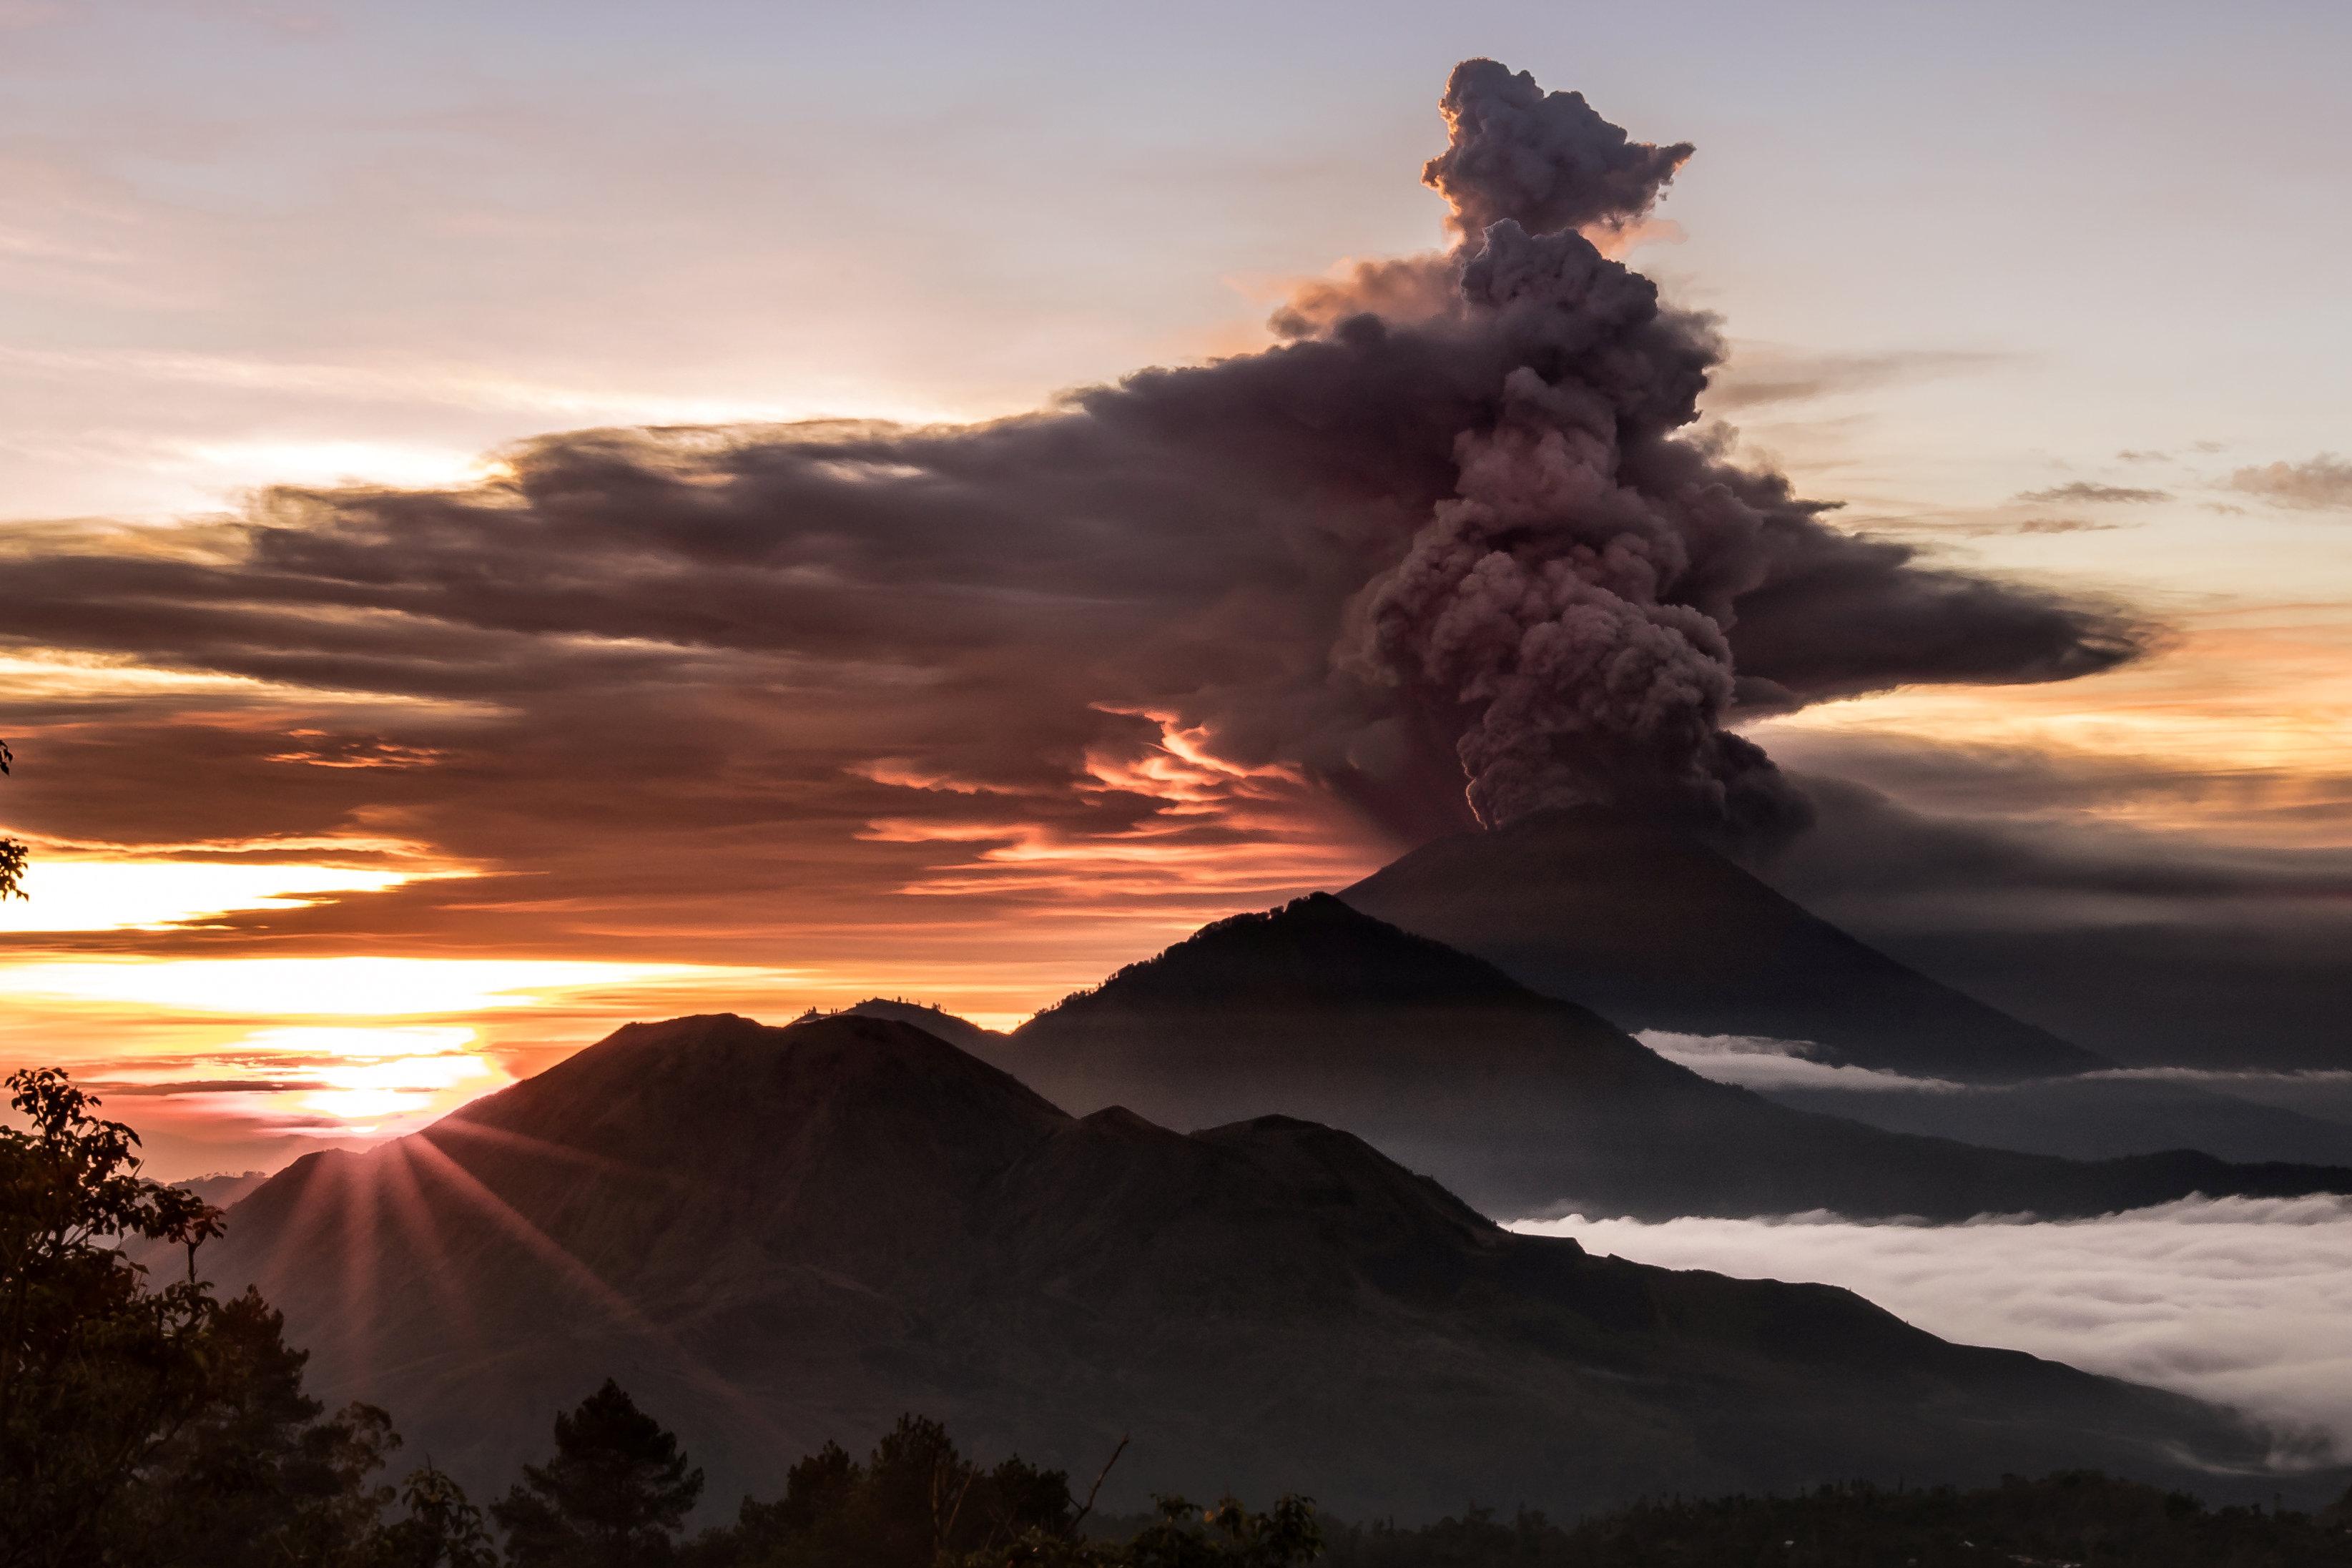 El volcánAgung este domingo (EMILIO KUZMA-FLOYD/via REUTERS)